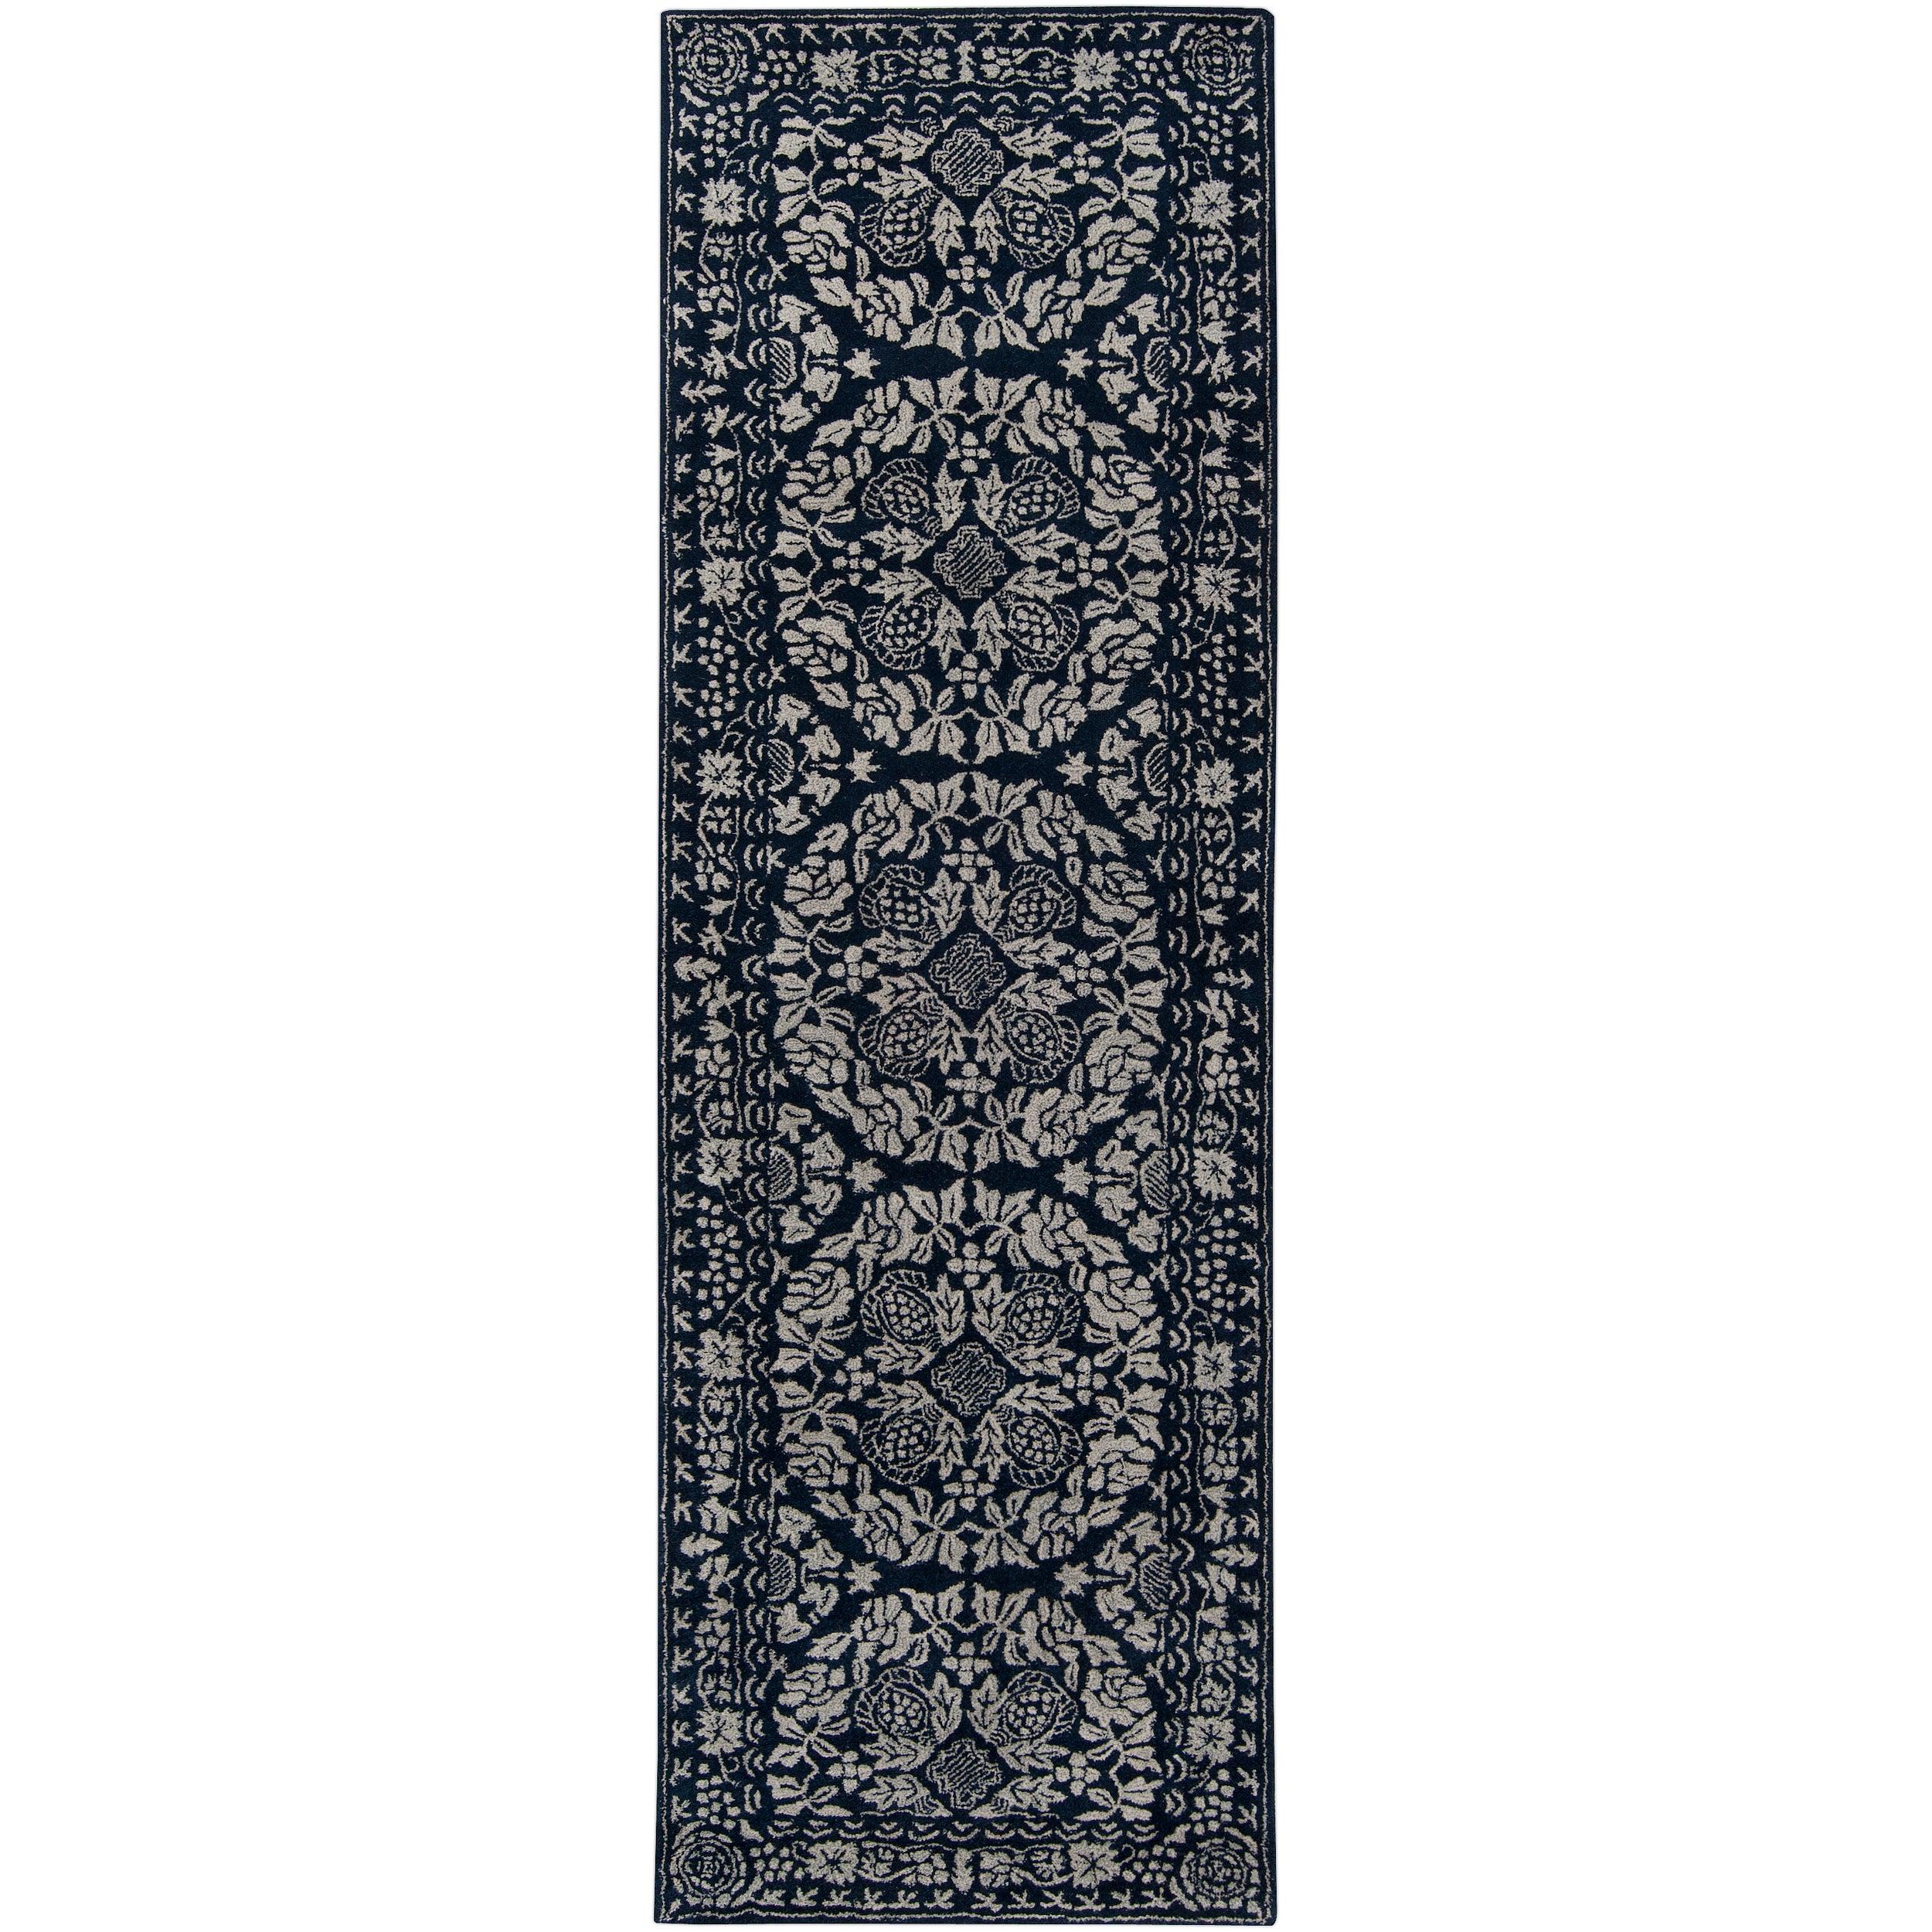 Smithsonian Hand-tufted Blue Ananke Oriental Pattern Wool Rug (2'6 x 8')